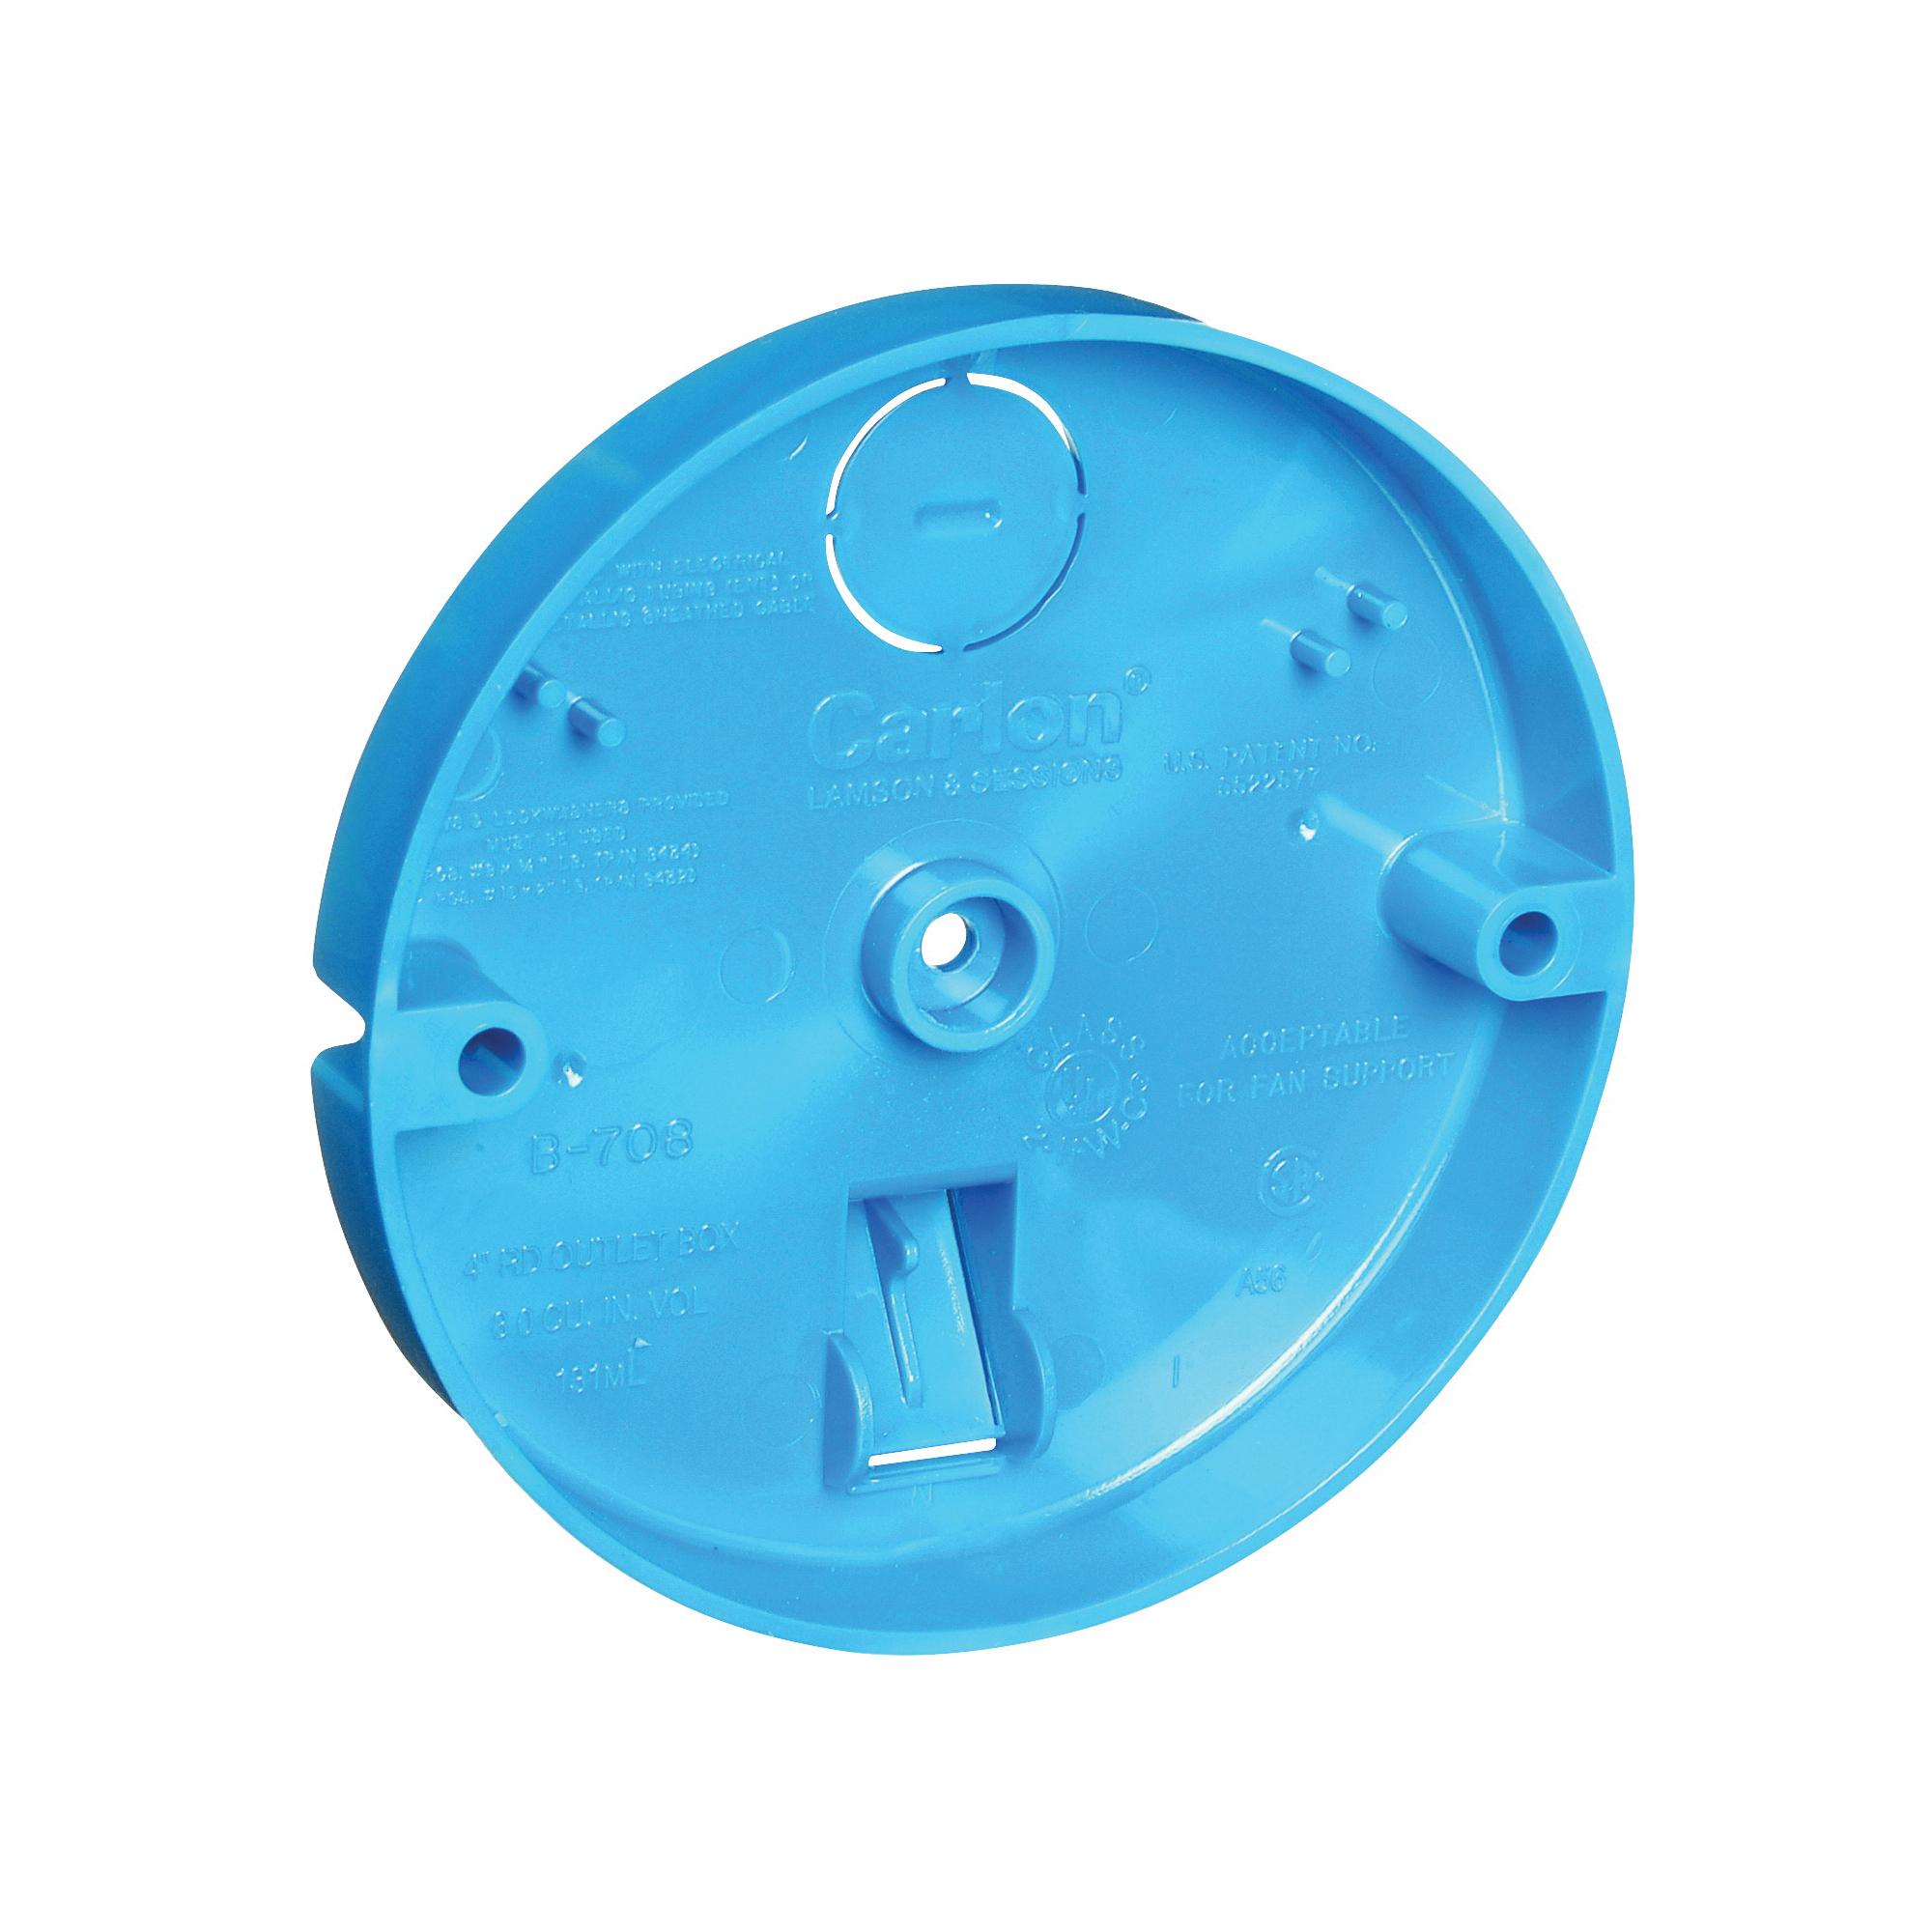 Picture of Carlon B708-SHK Ceiling Pan Box, 1/2 in L, PVC, Blue